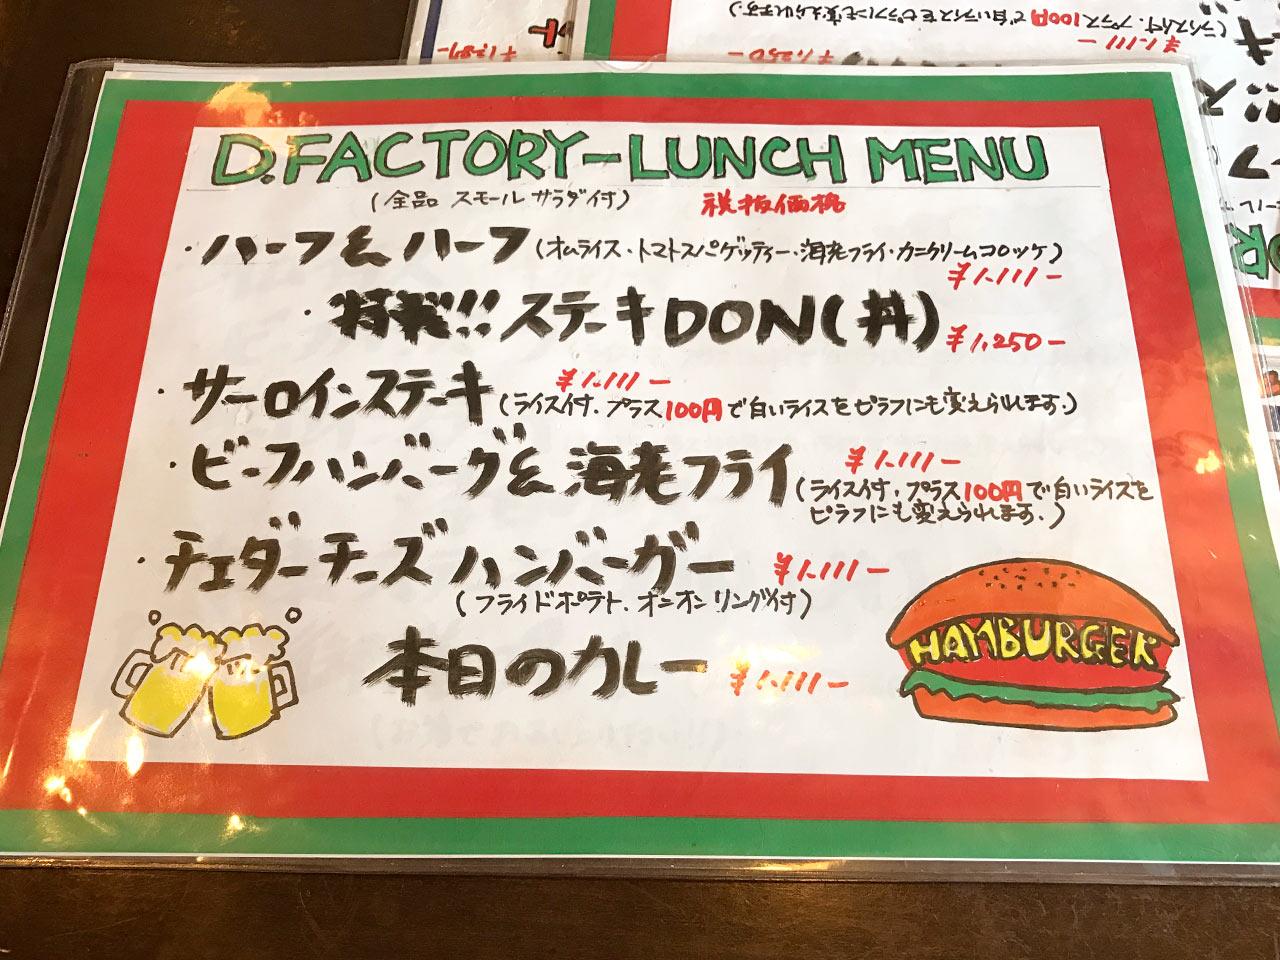 musashikoyama-d-factory-lunch-menu01